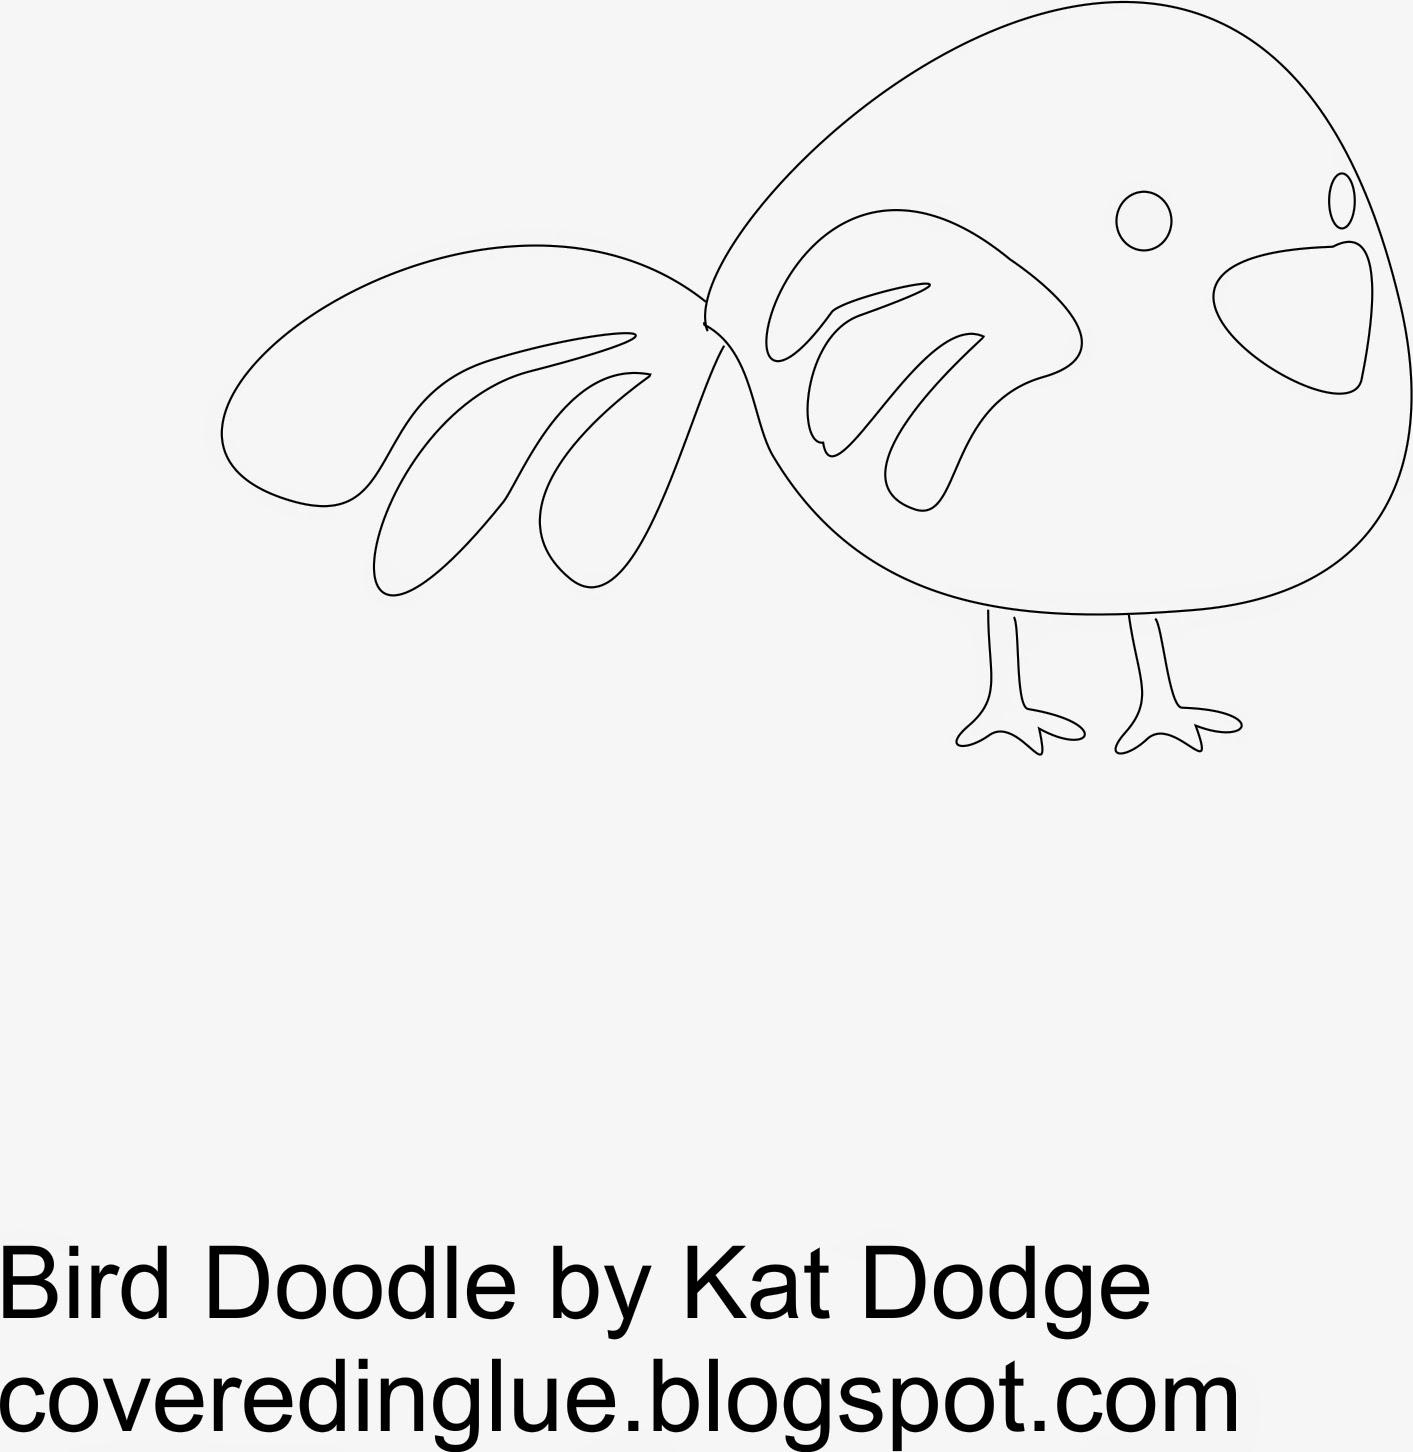 http://3.bp.blogspot.com/-WLx6ZeZNKUY/VRbOAy1_37I/AAAAAAAAMOc/2MXRTFhhV48/s1600/doodlebird_coveredinglue.jpg